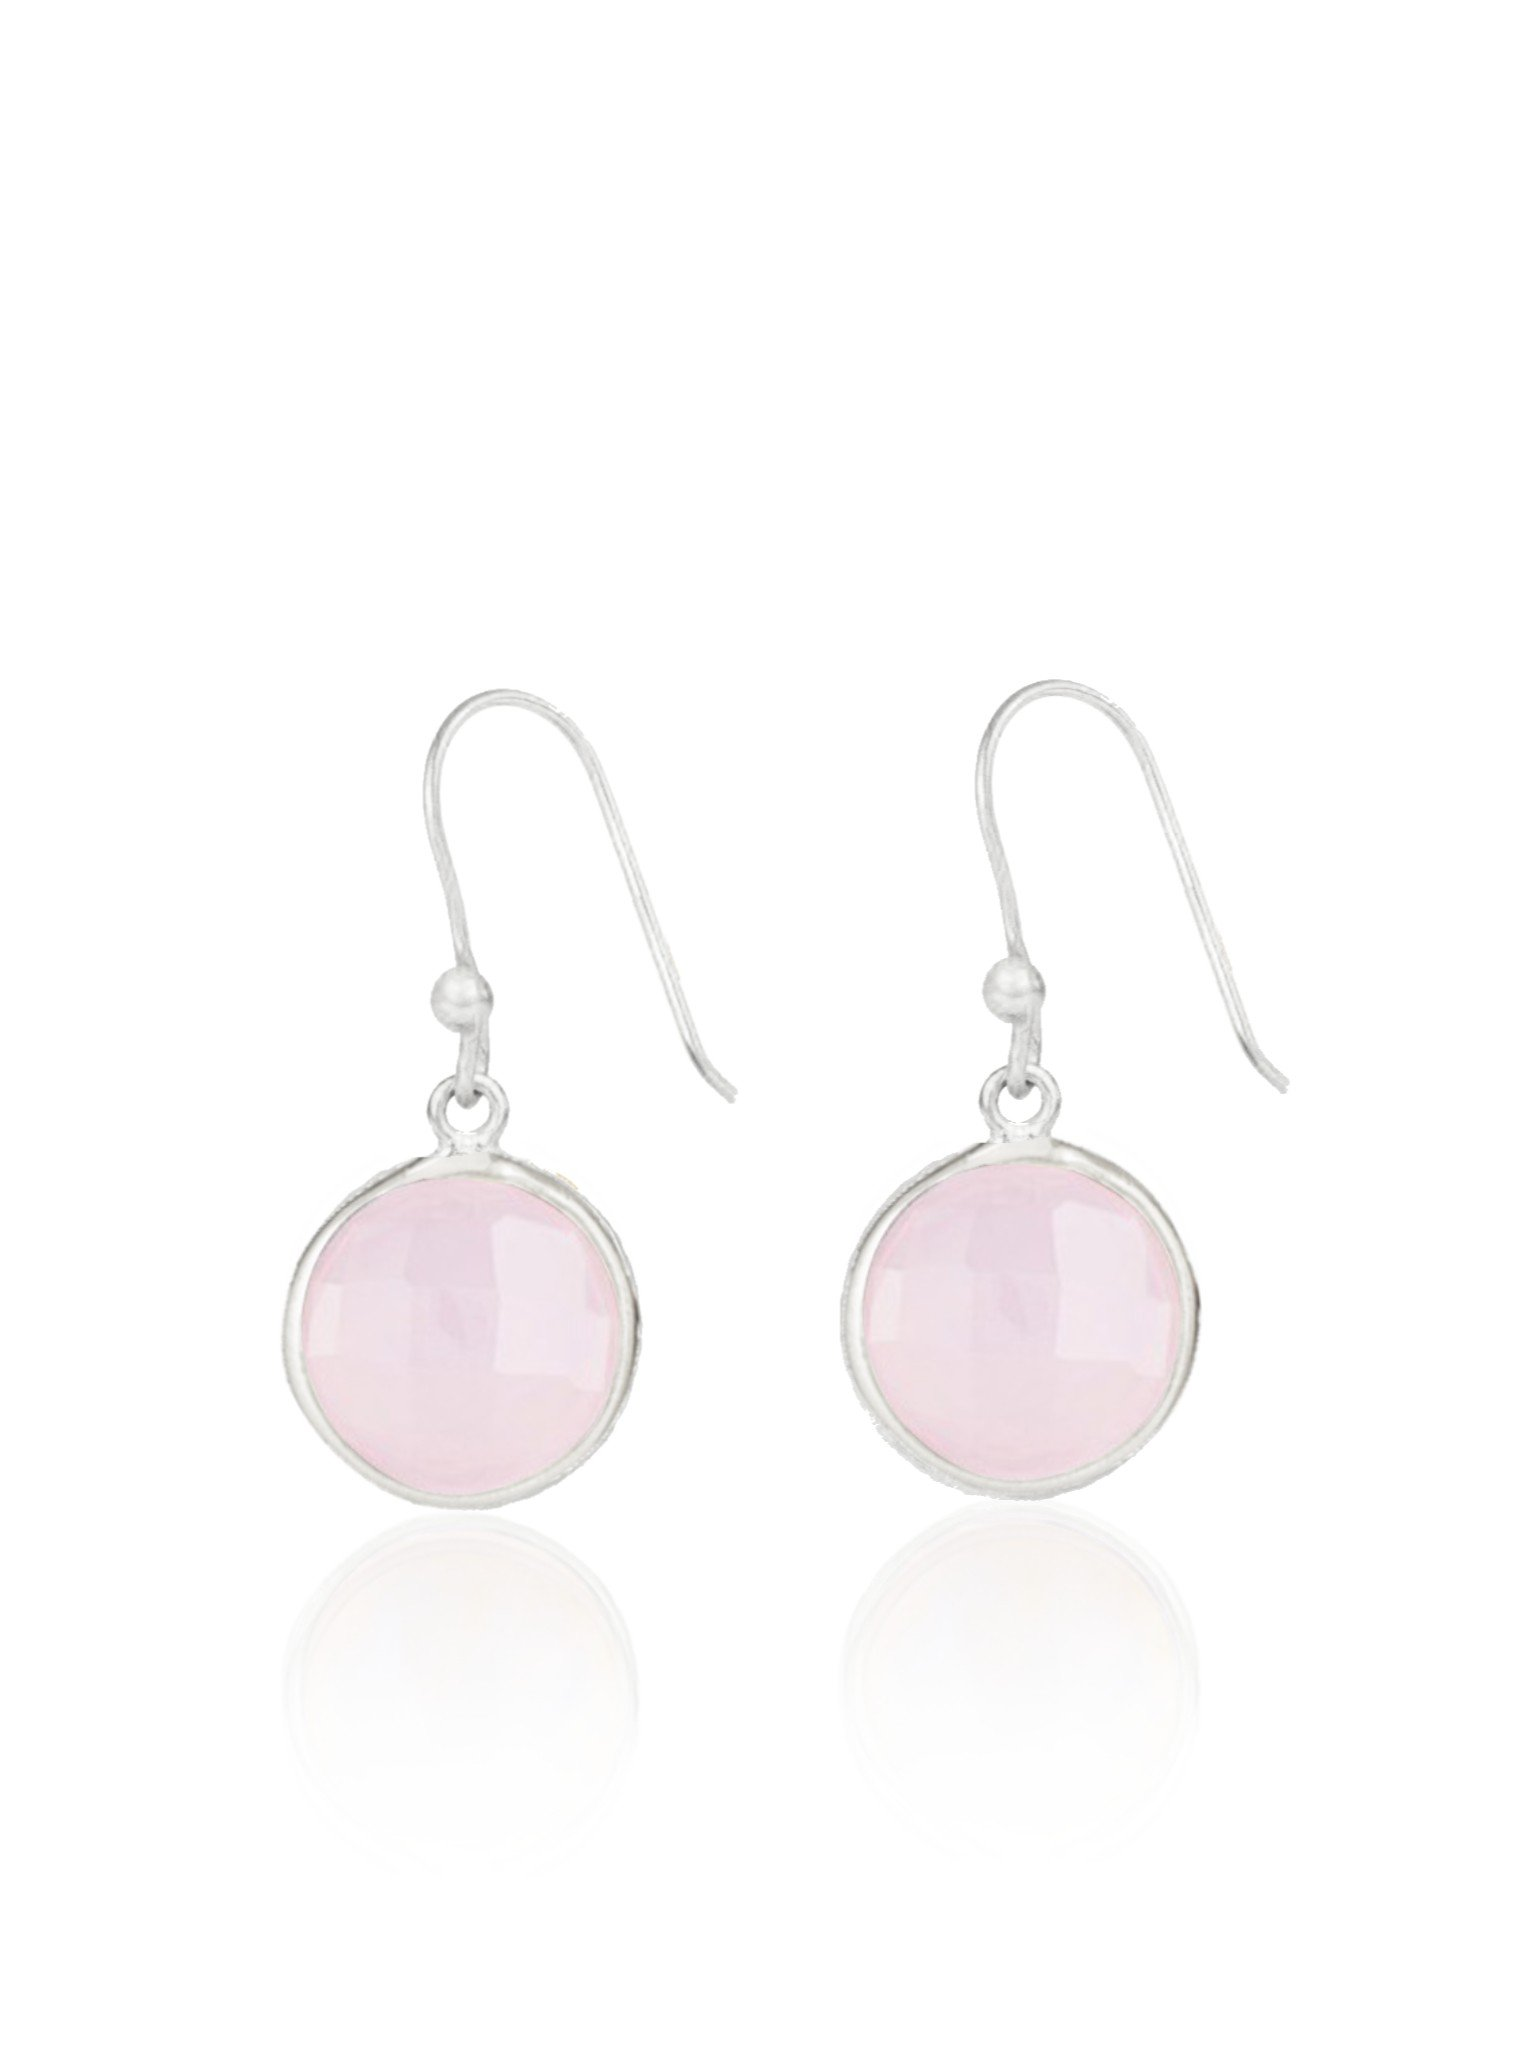 Belle Simple Rose Quartz Earrings in Silver